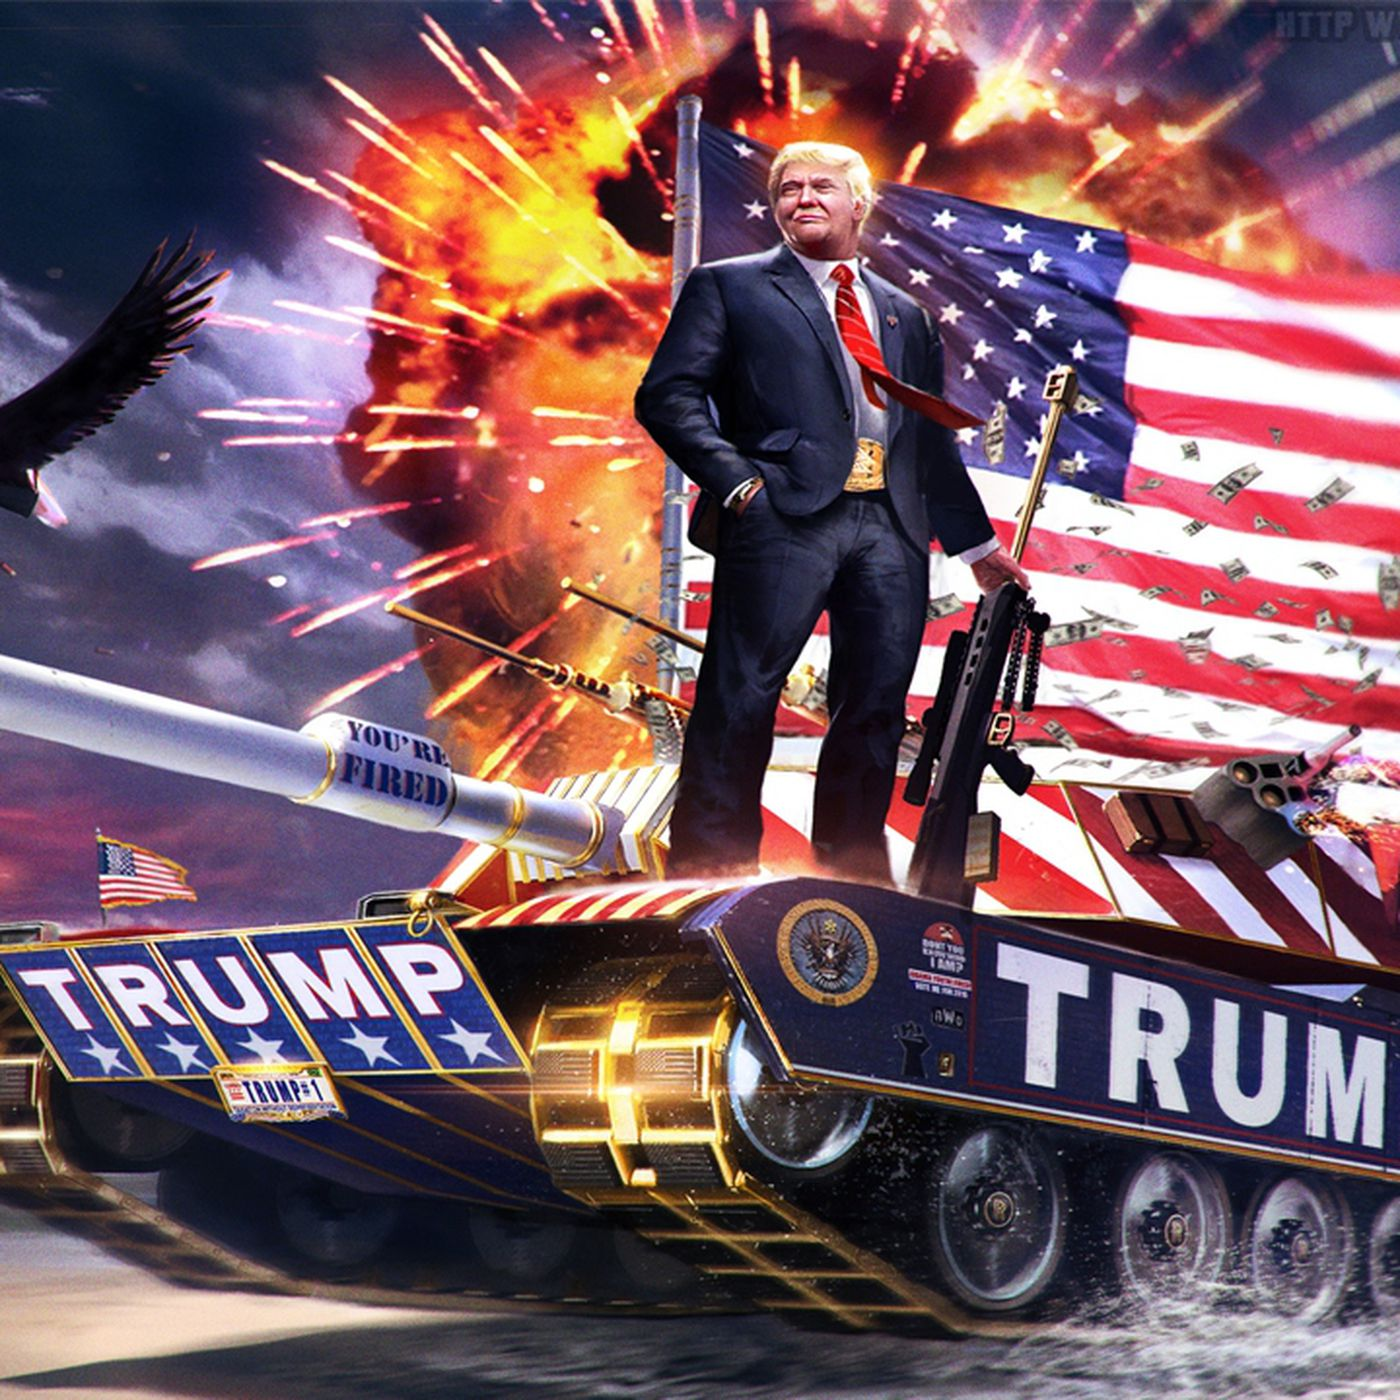 That Trump Tank Meme On Cesar Sayoc S Van Was Made As A Joke